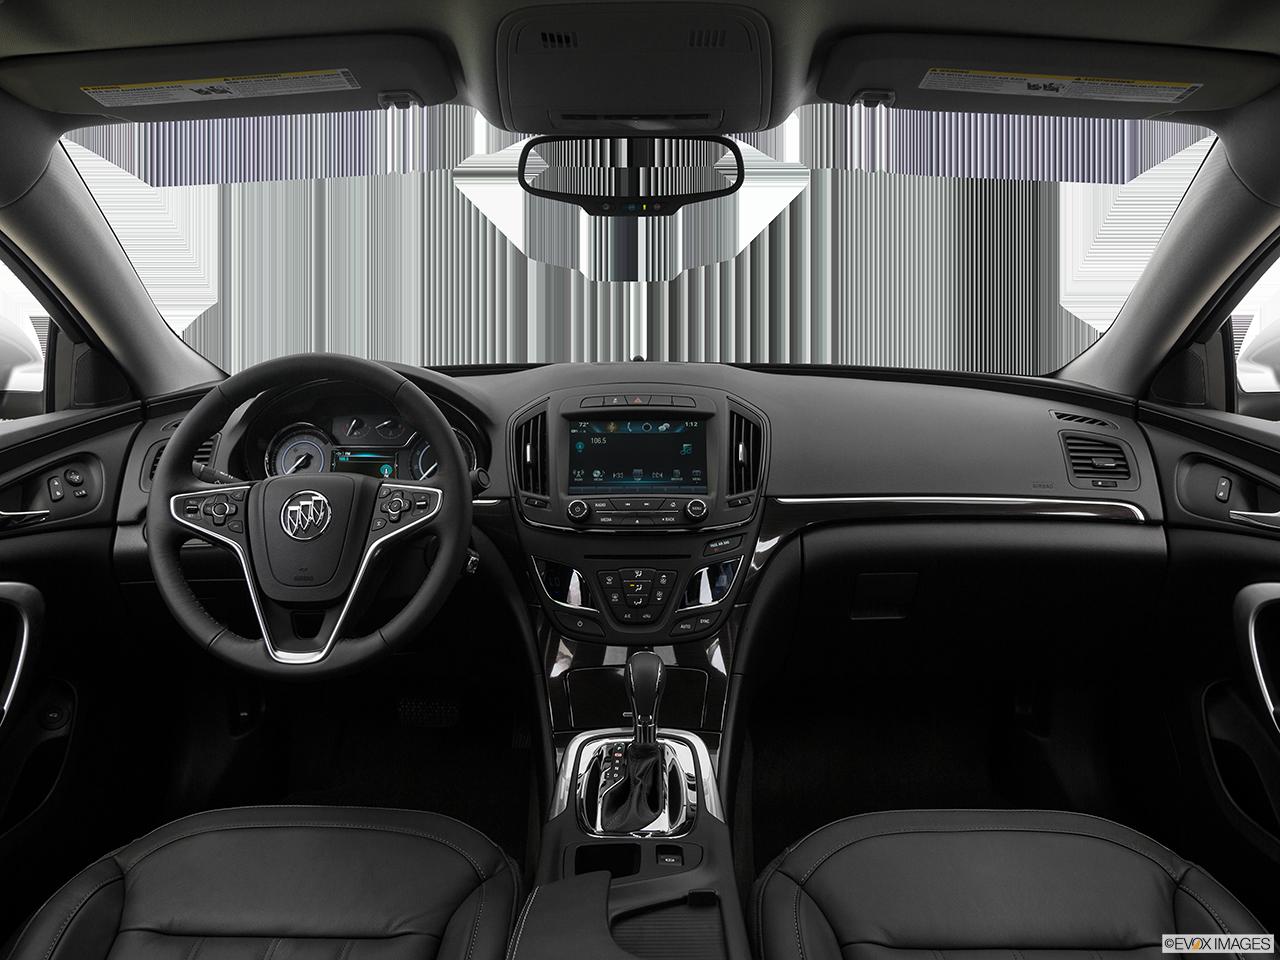 Interior View Of 2017 Buick Regal in Costa Mesa